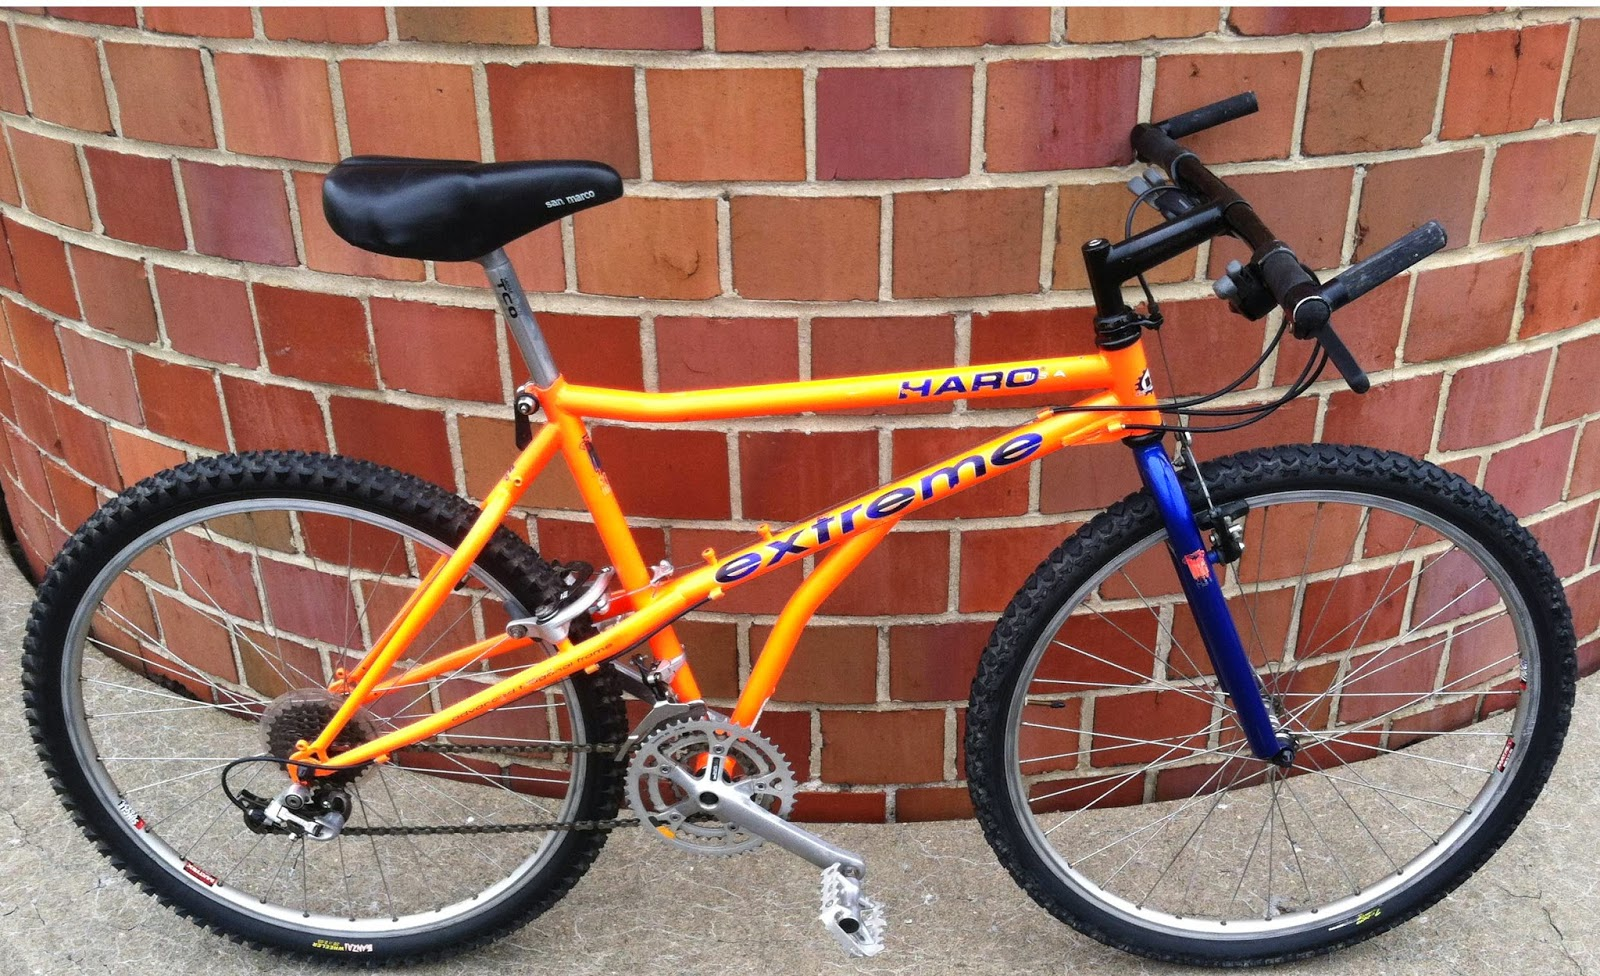 1992 Haro Extreme Mountain Bike | Whistle Bike Shop